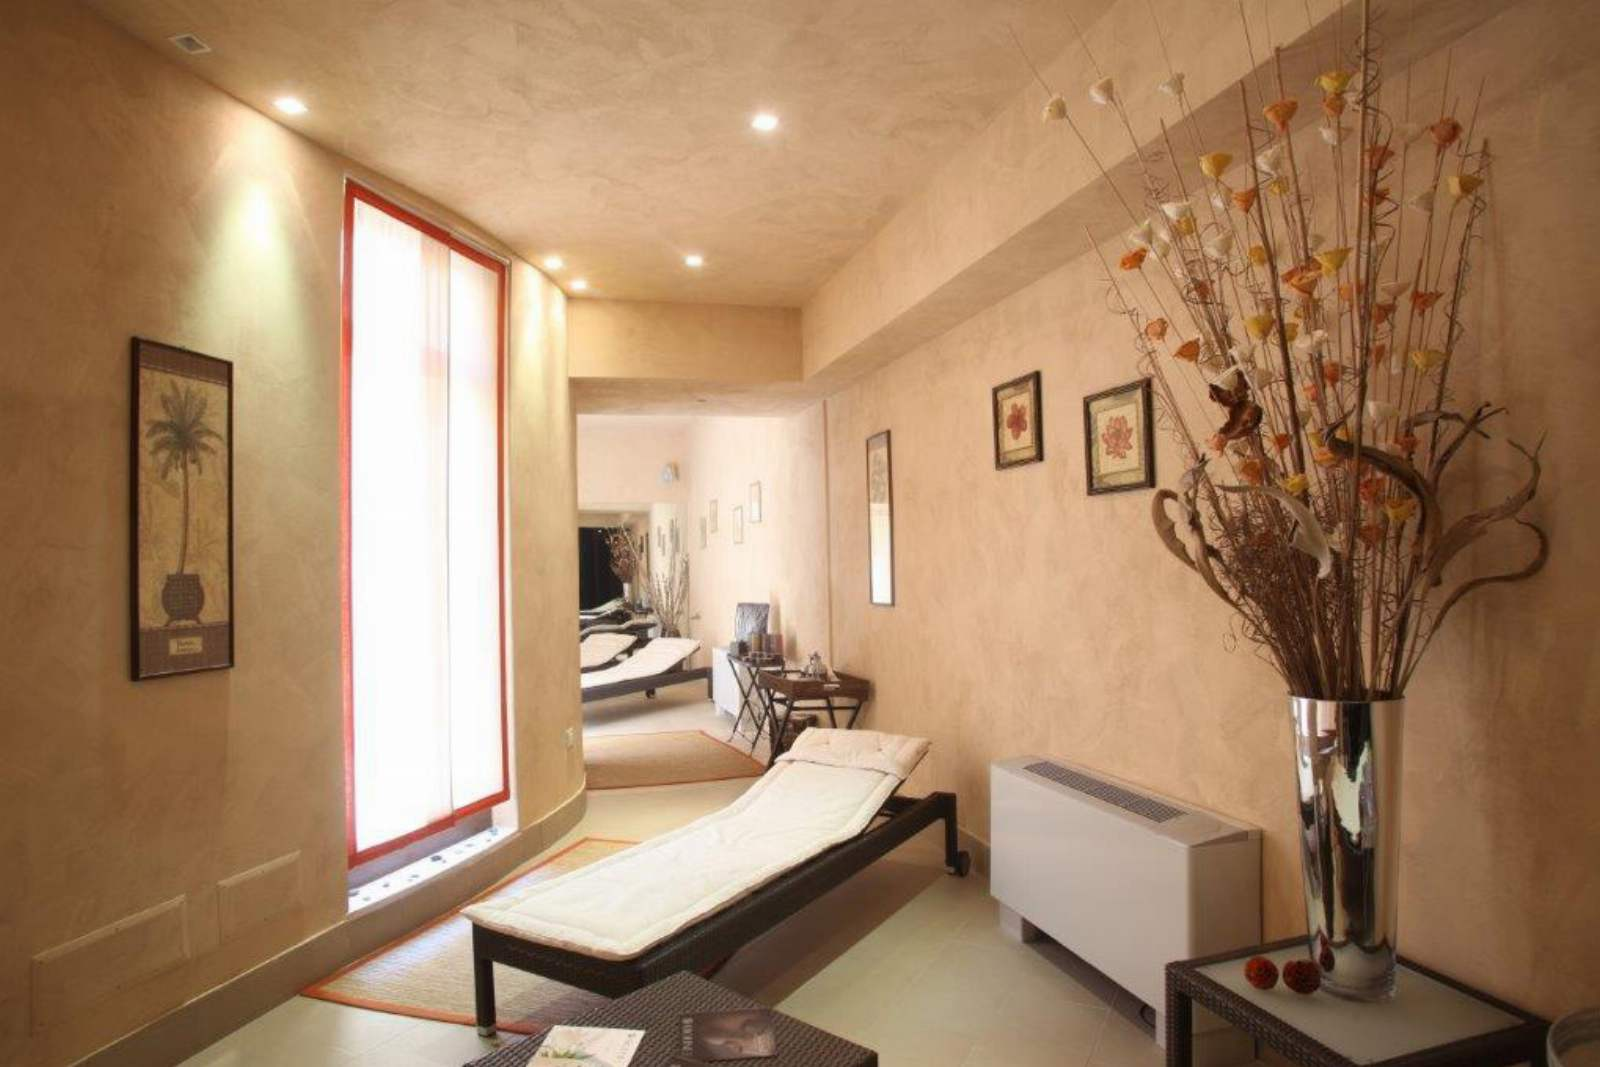 Falconara Resort & Spa: room / property / locale photo. Image 8